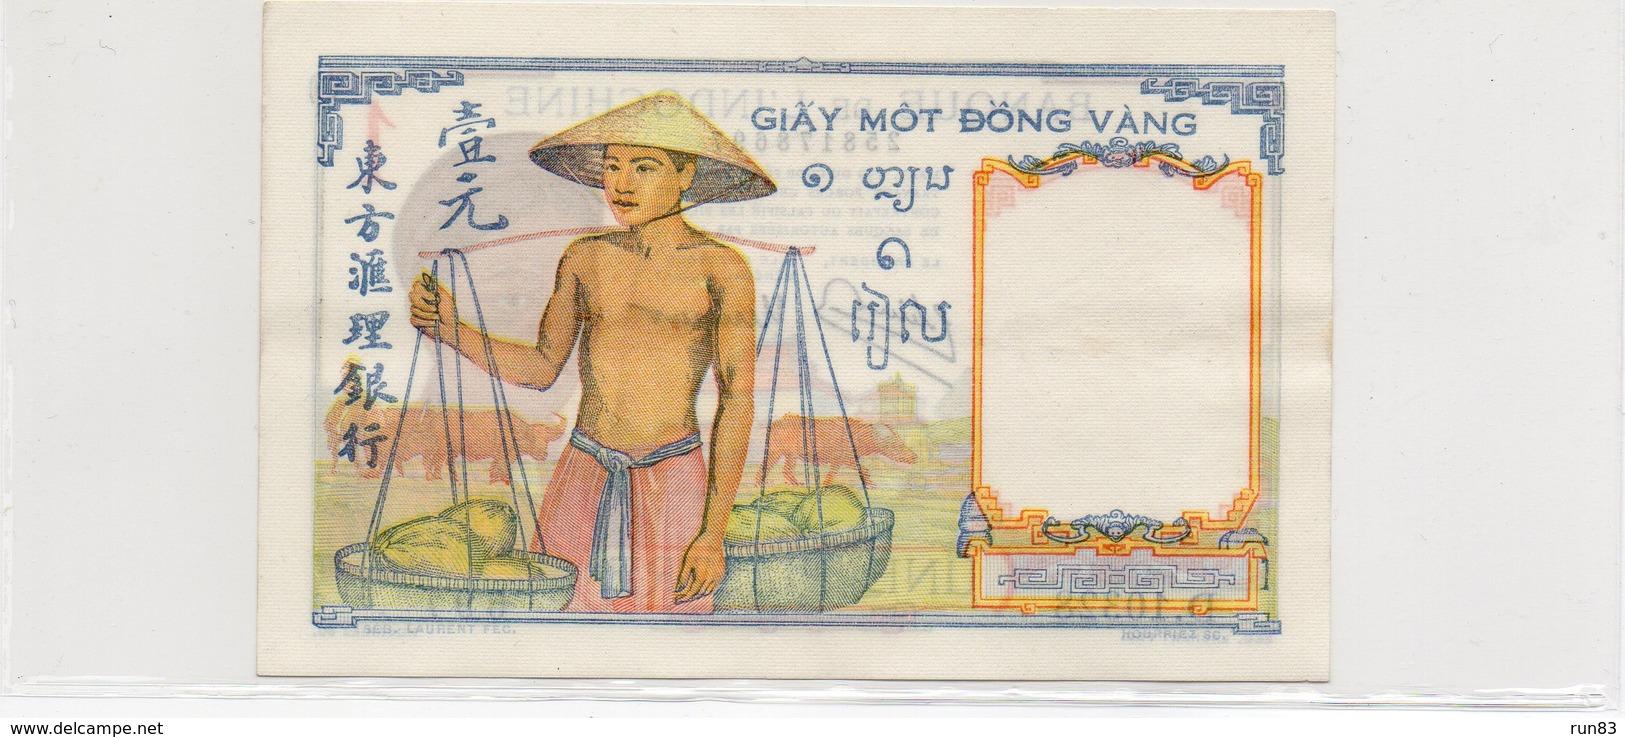 INDOCHINE / Superbe Billet De 1932 / 39 UNC N° 54 De Paper Money Cote + De 120.00 Euros - Indochine